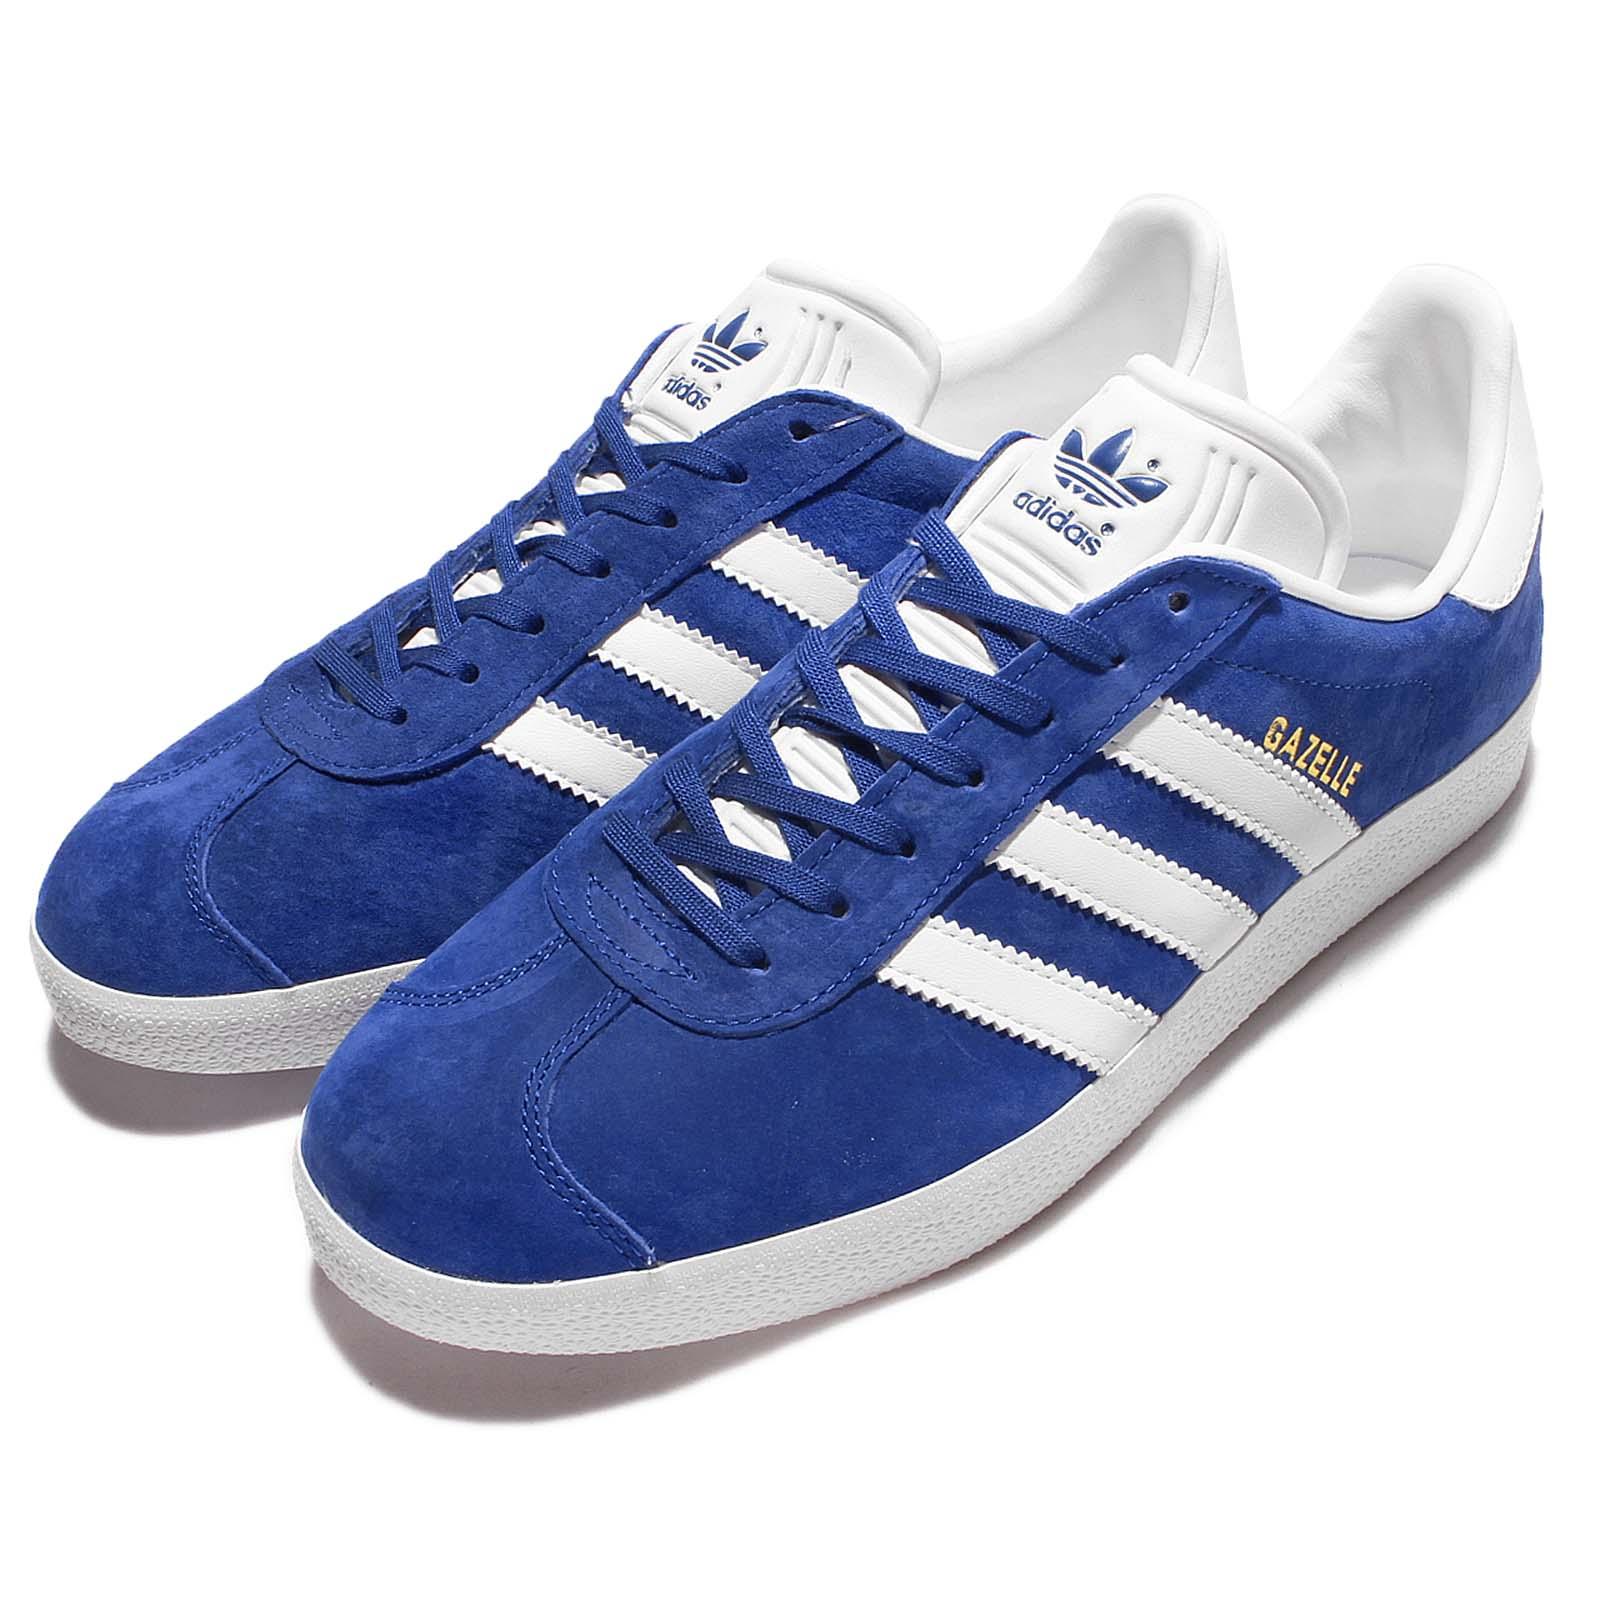 adidas Gazelle W 復古 金標 女鞋 男鞋 S76227